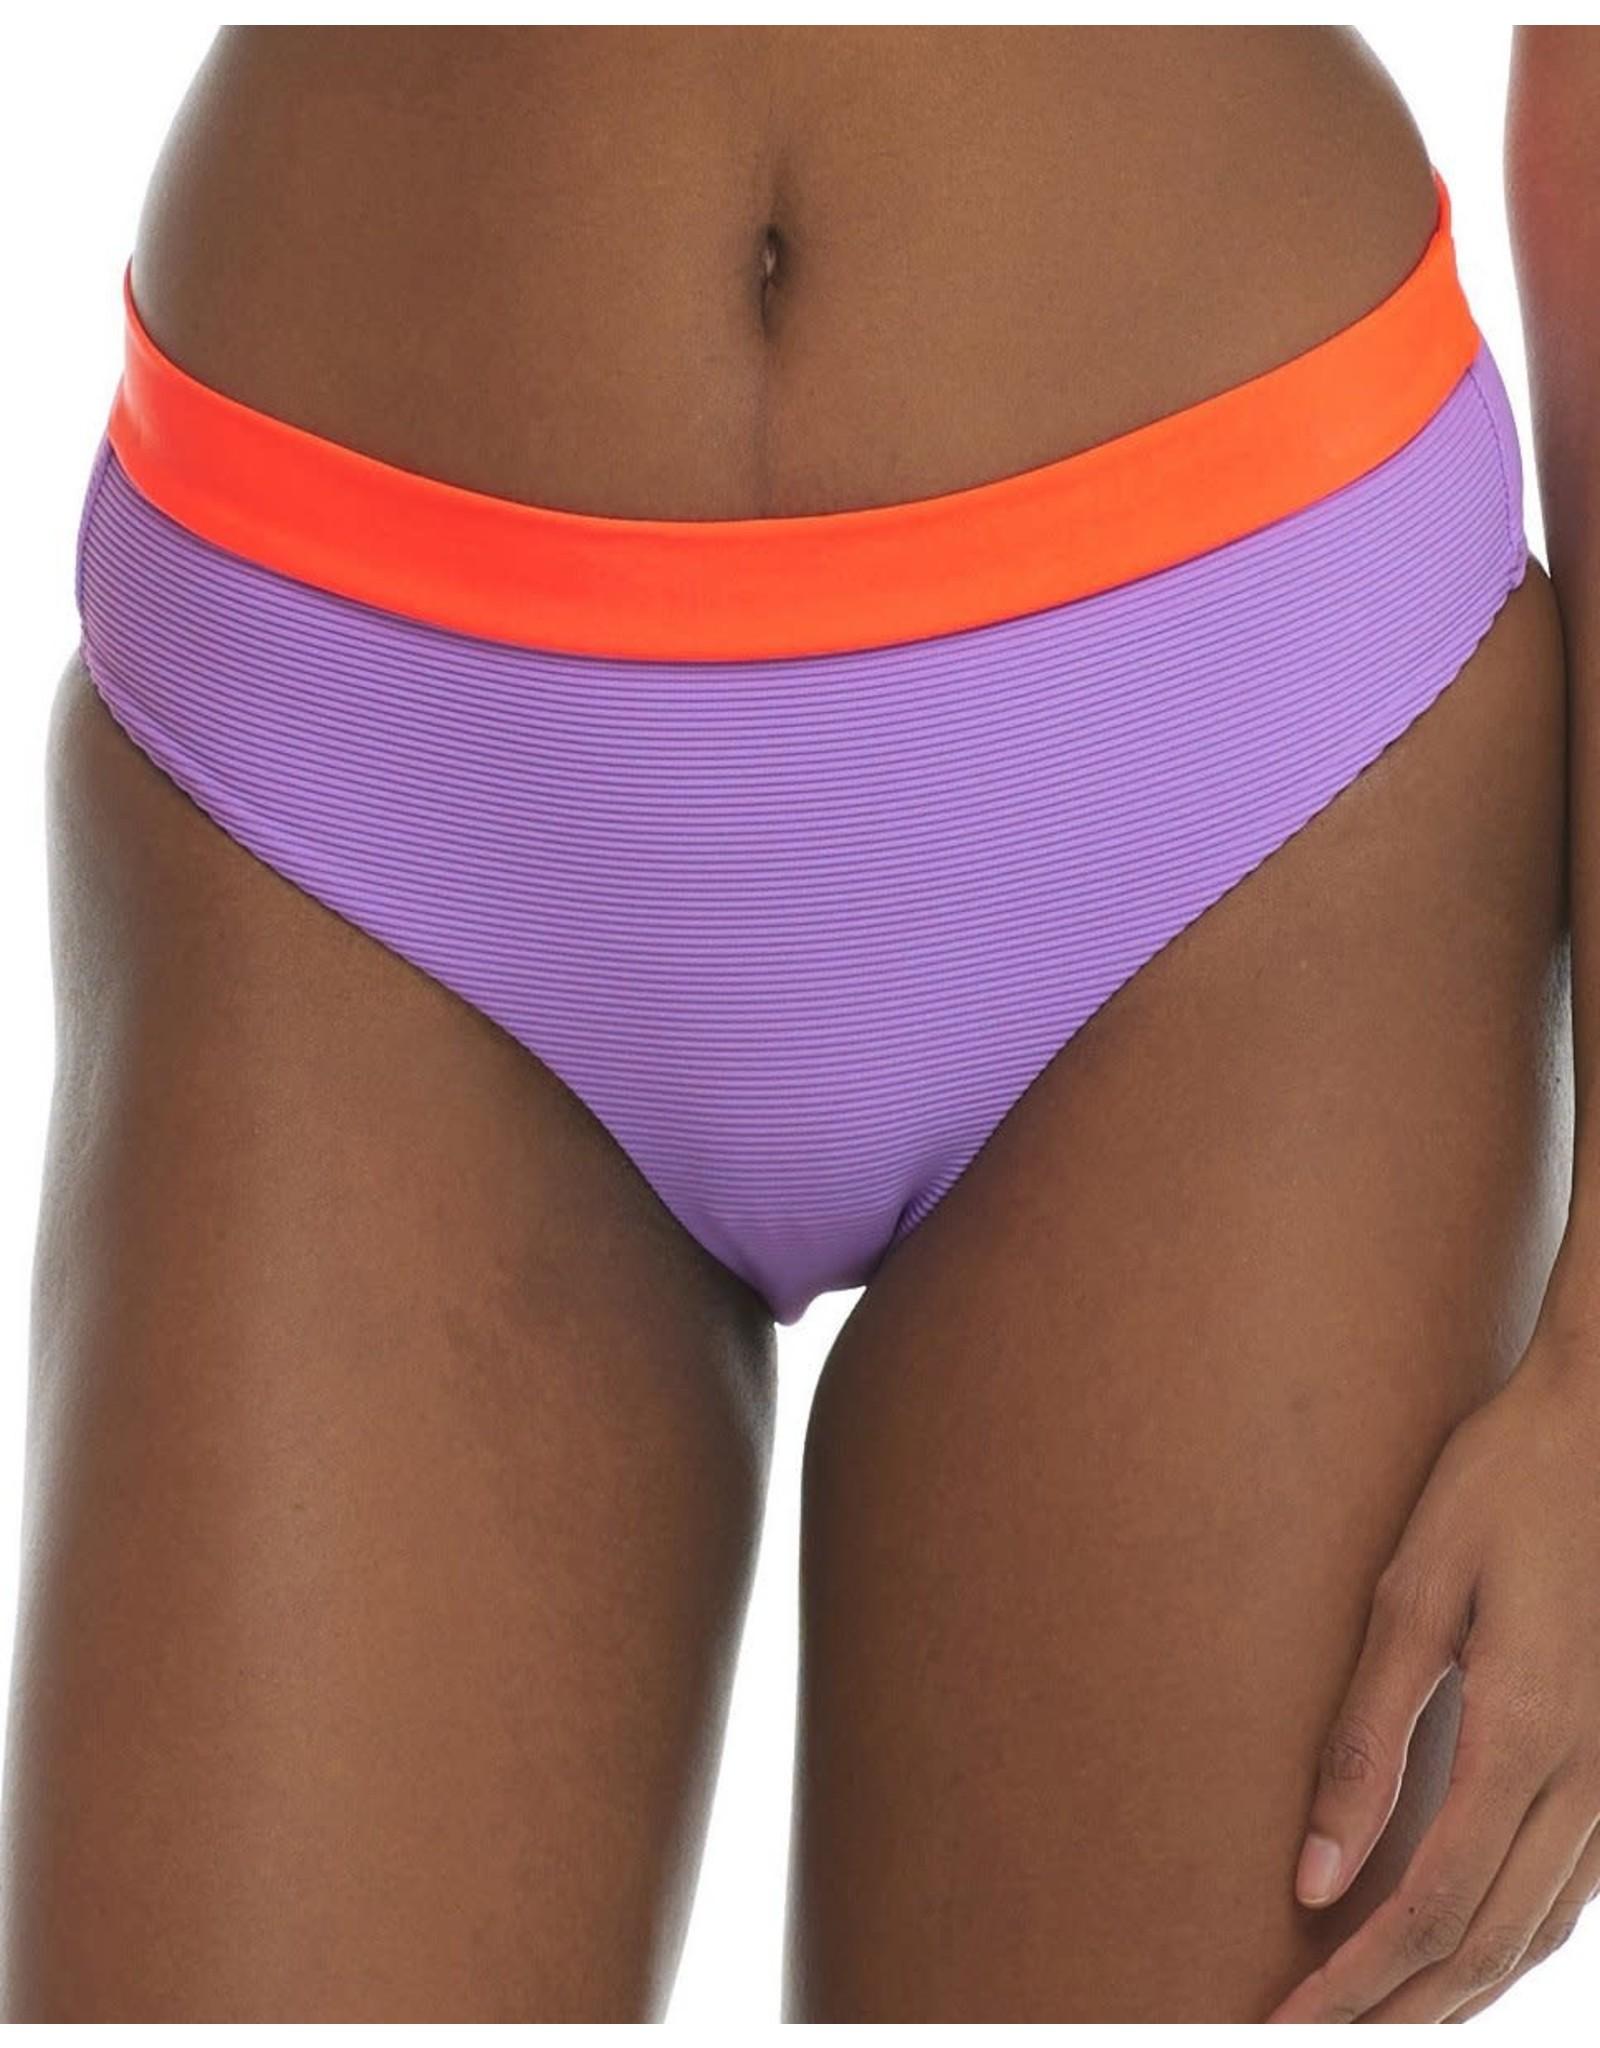 Body Glove Spectrum Marlee High-Waist Bikini Bottom